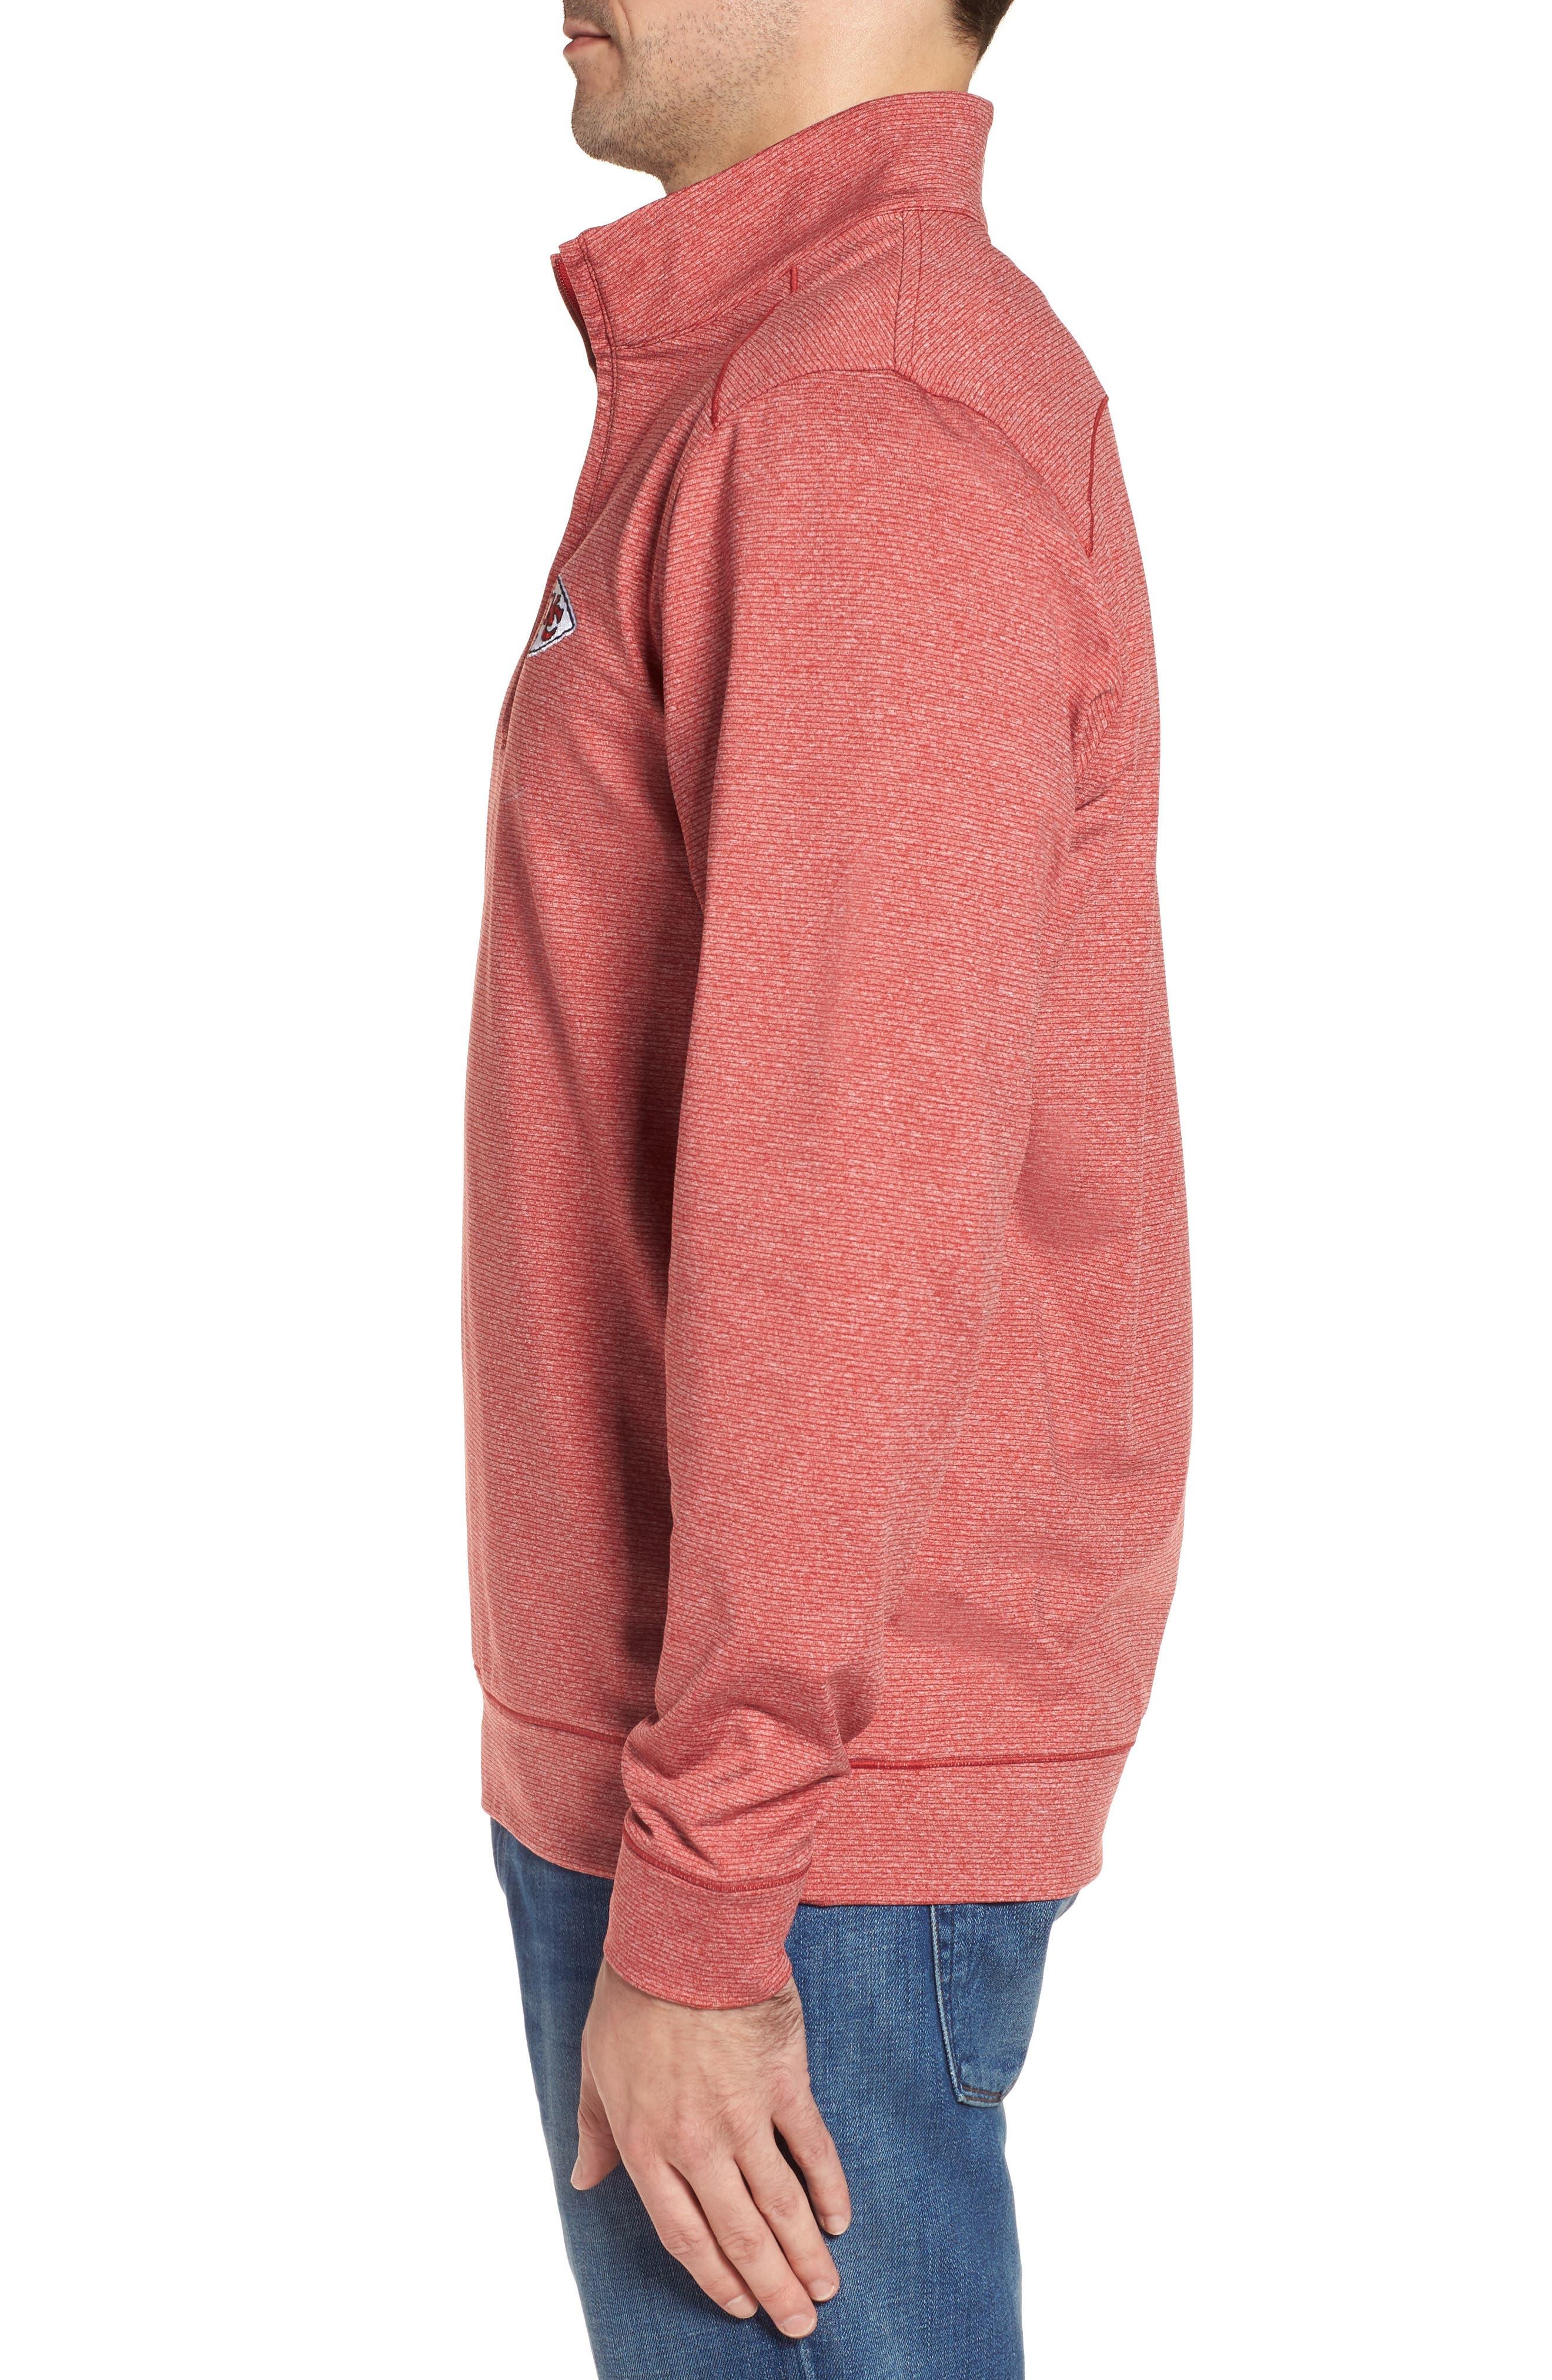 Shoreline - Kansas City Chiefs Half Zip Pullover,                             Alternate thumbnail 3, color,                             615